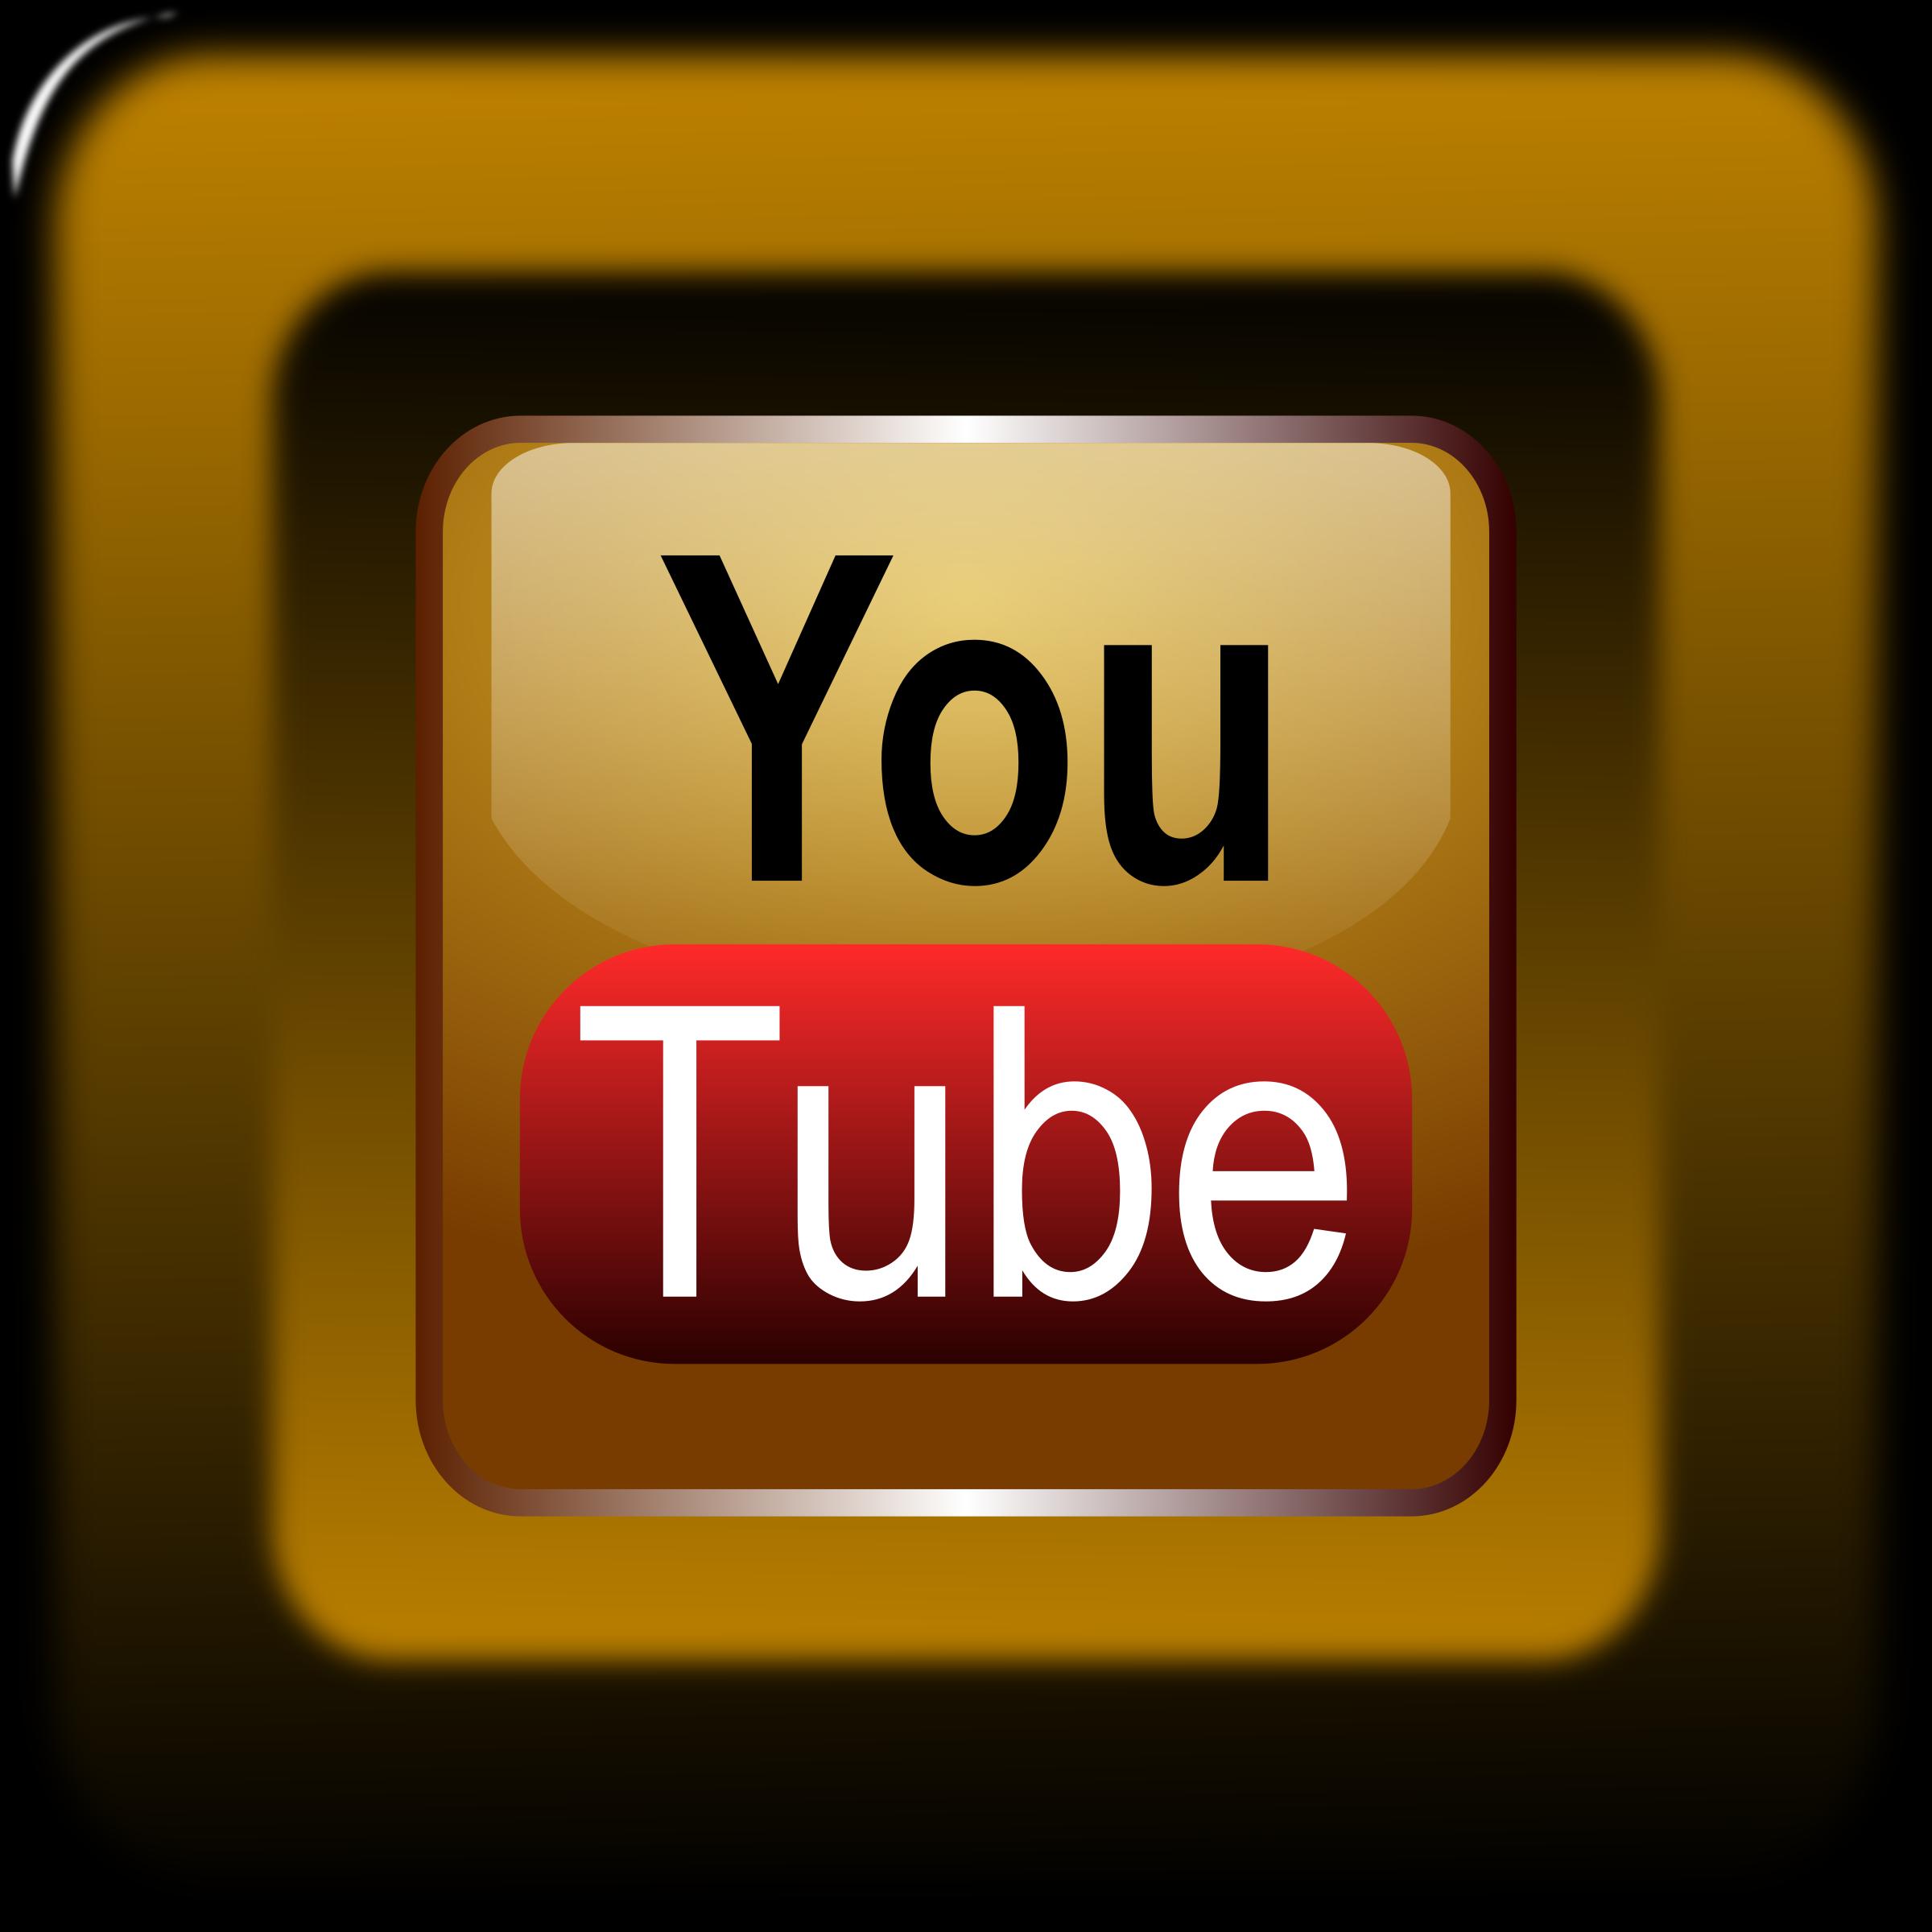 Logo clipart youtube Youtube Youtube Logo Logo Clipart